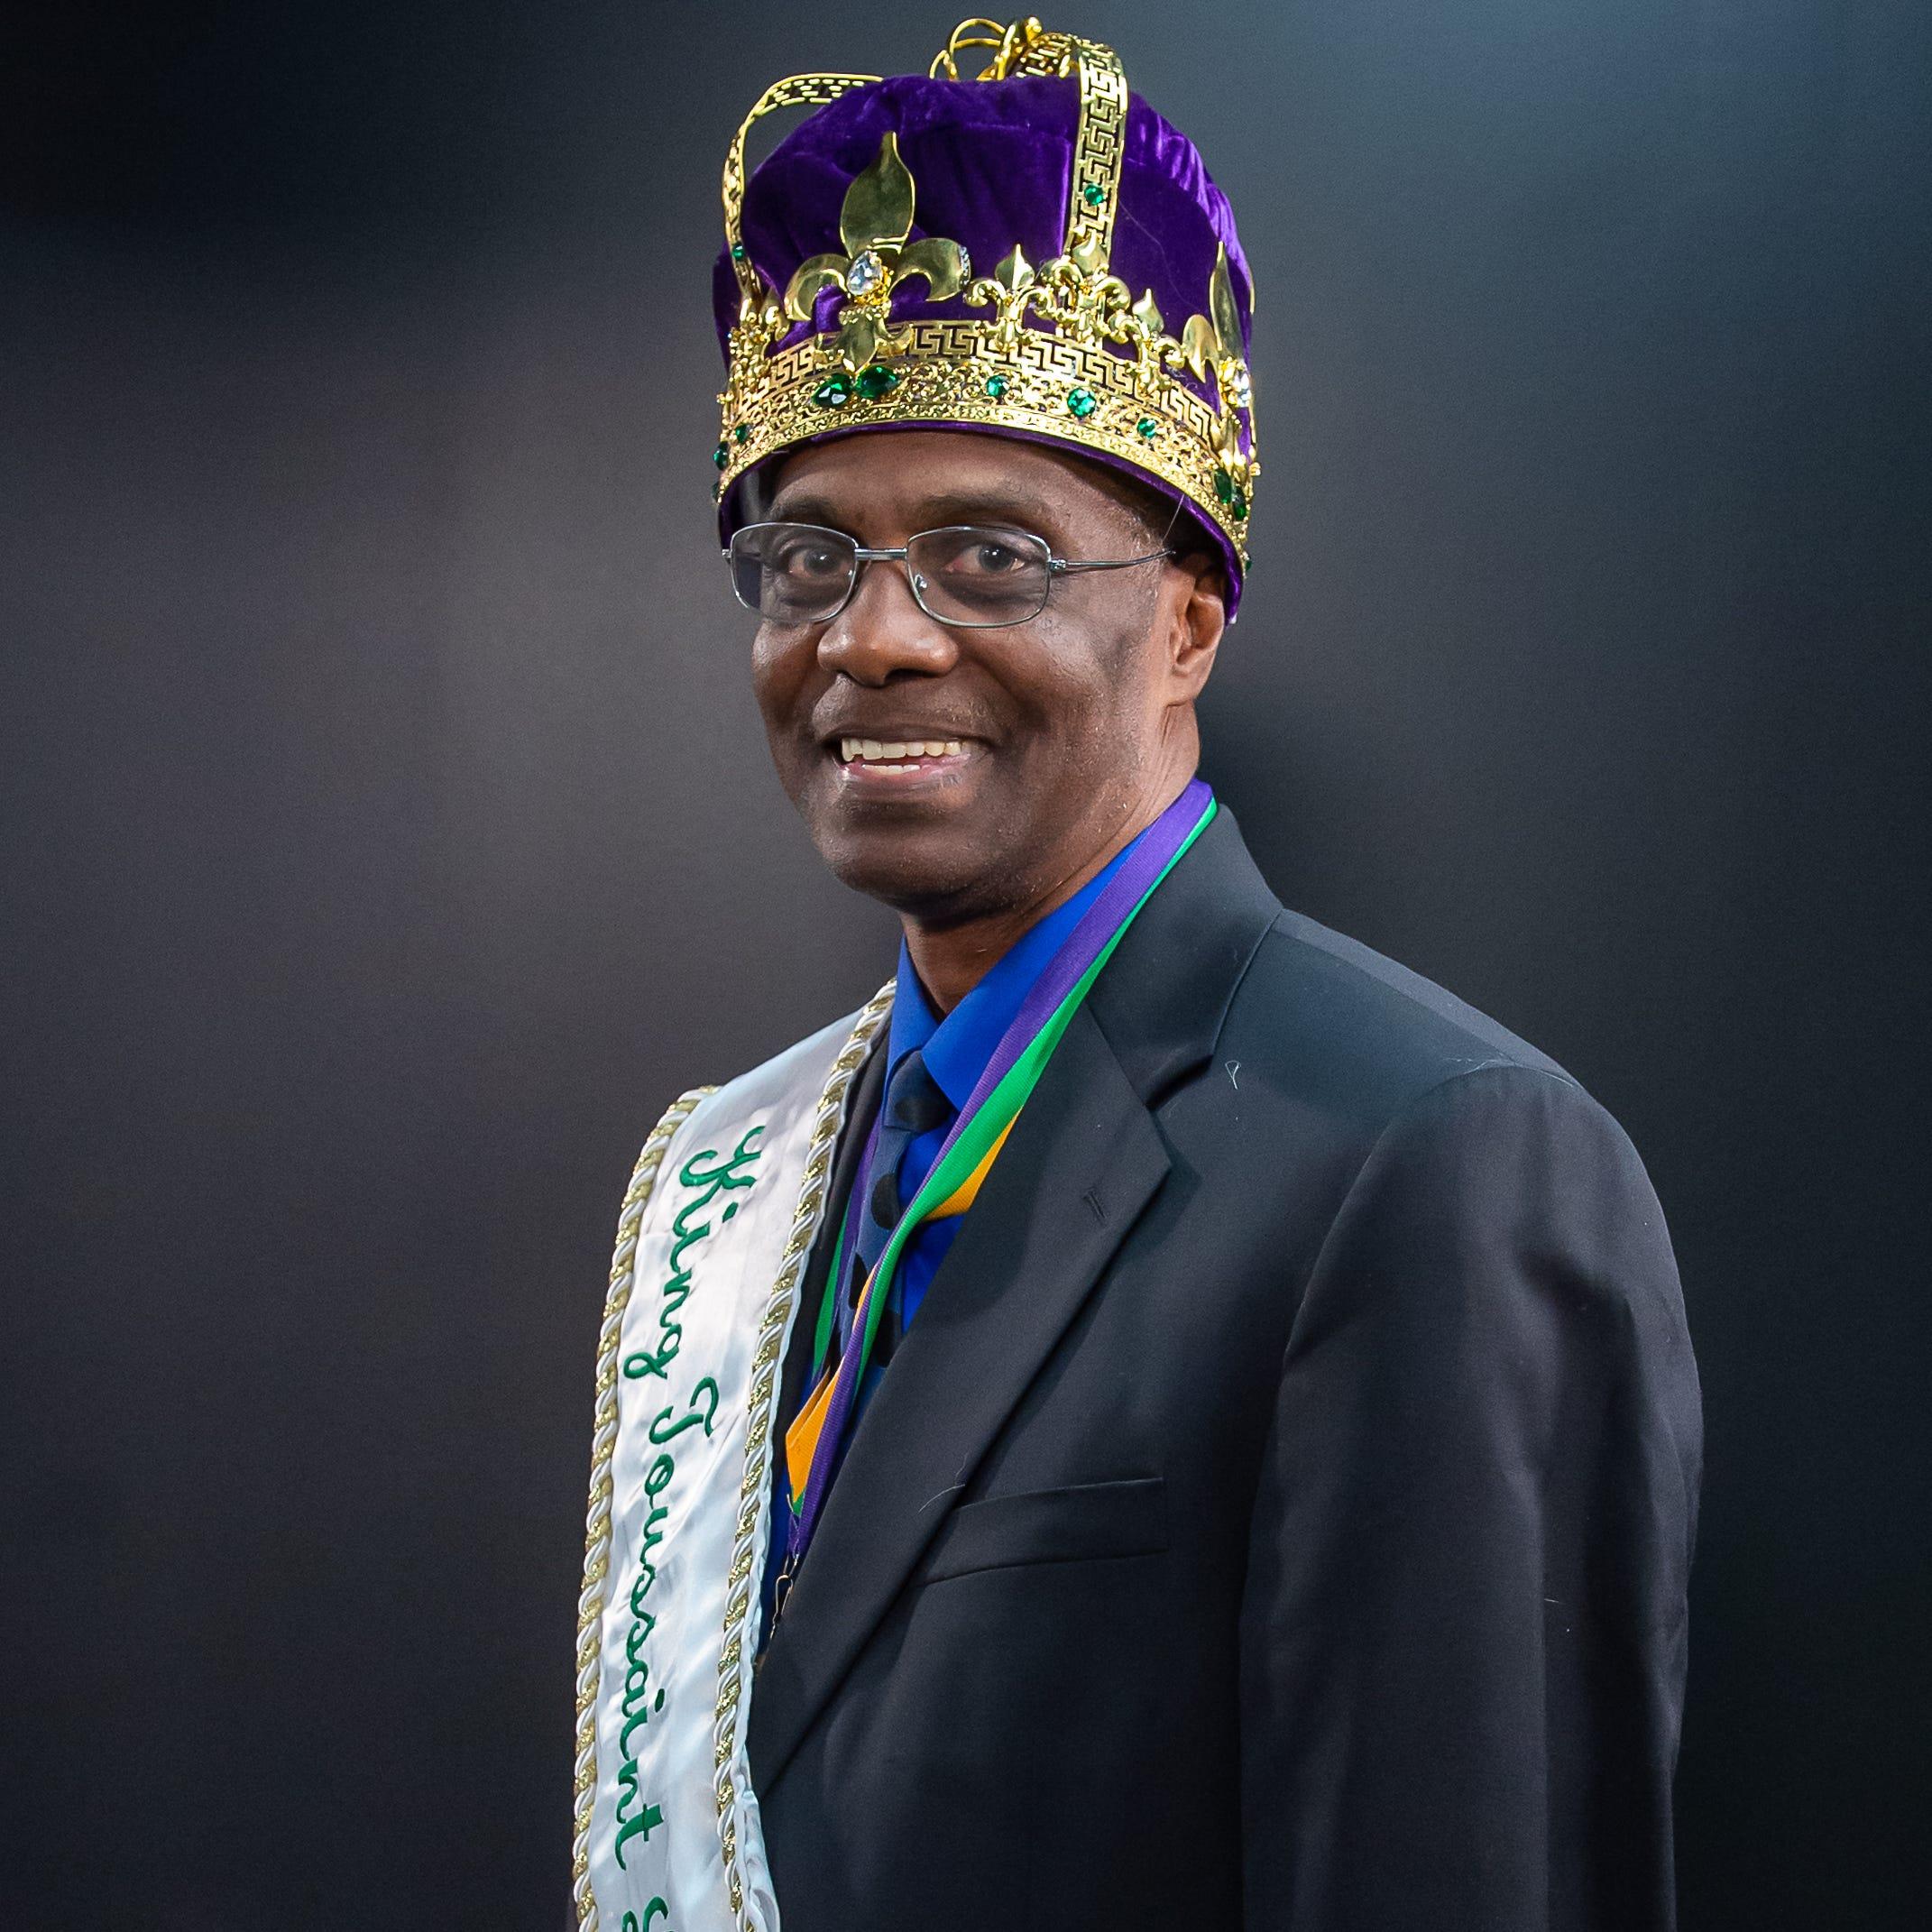 Meet King Toussaint L'Ouverture LXI, Carl Simon